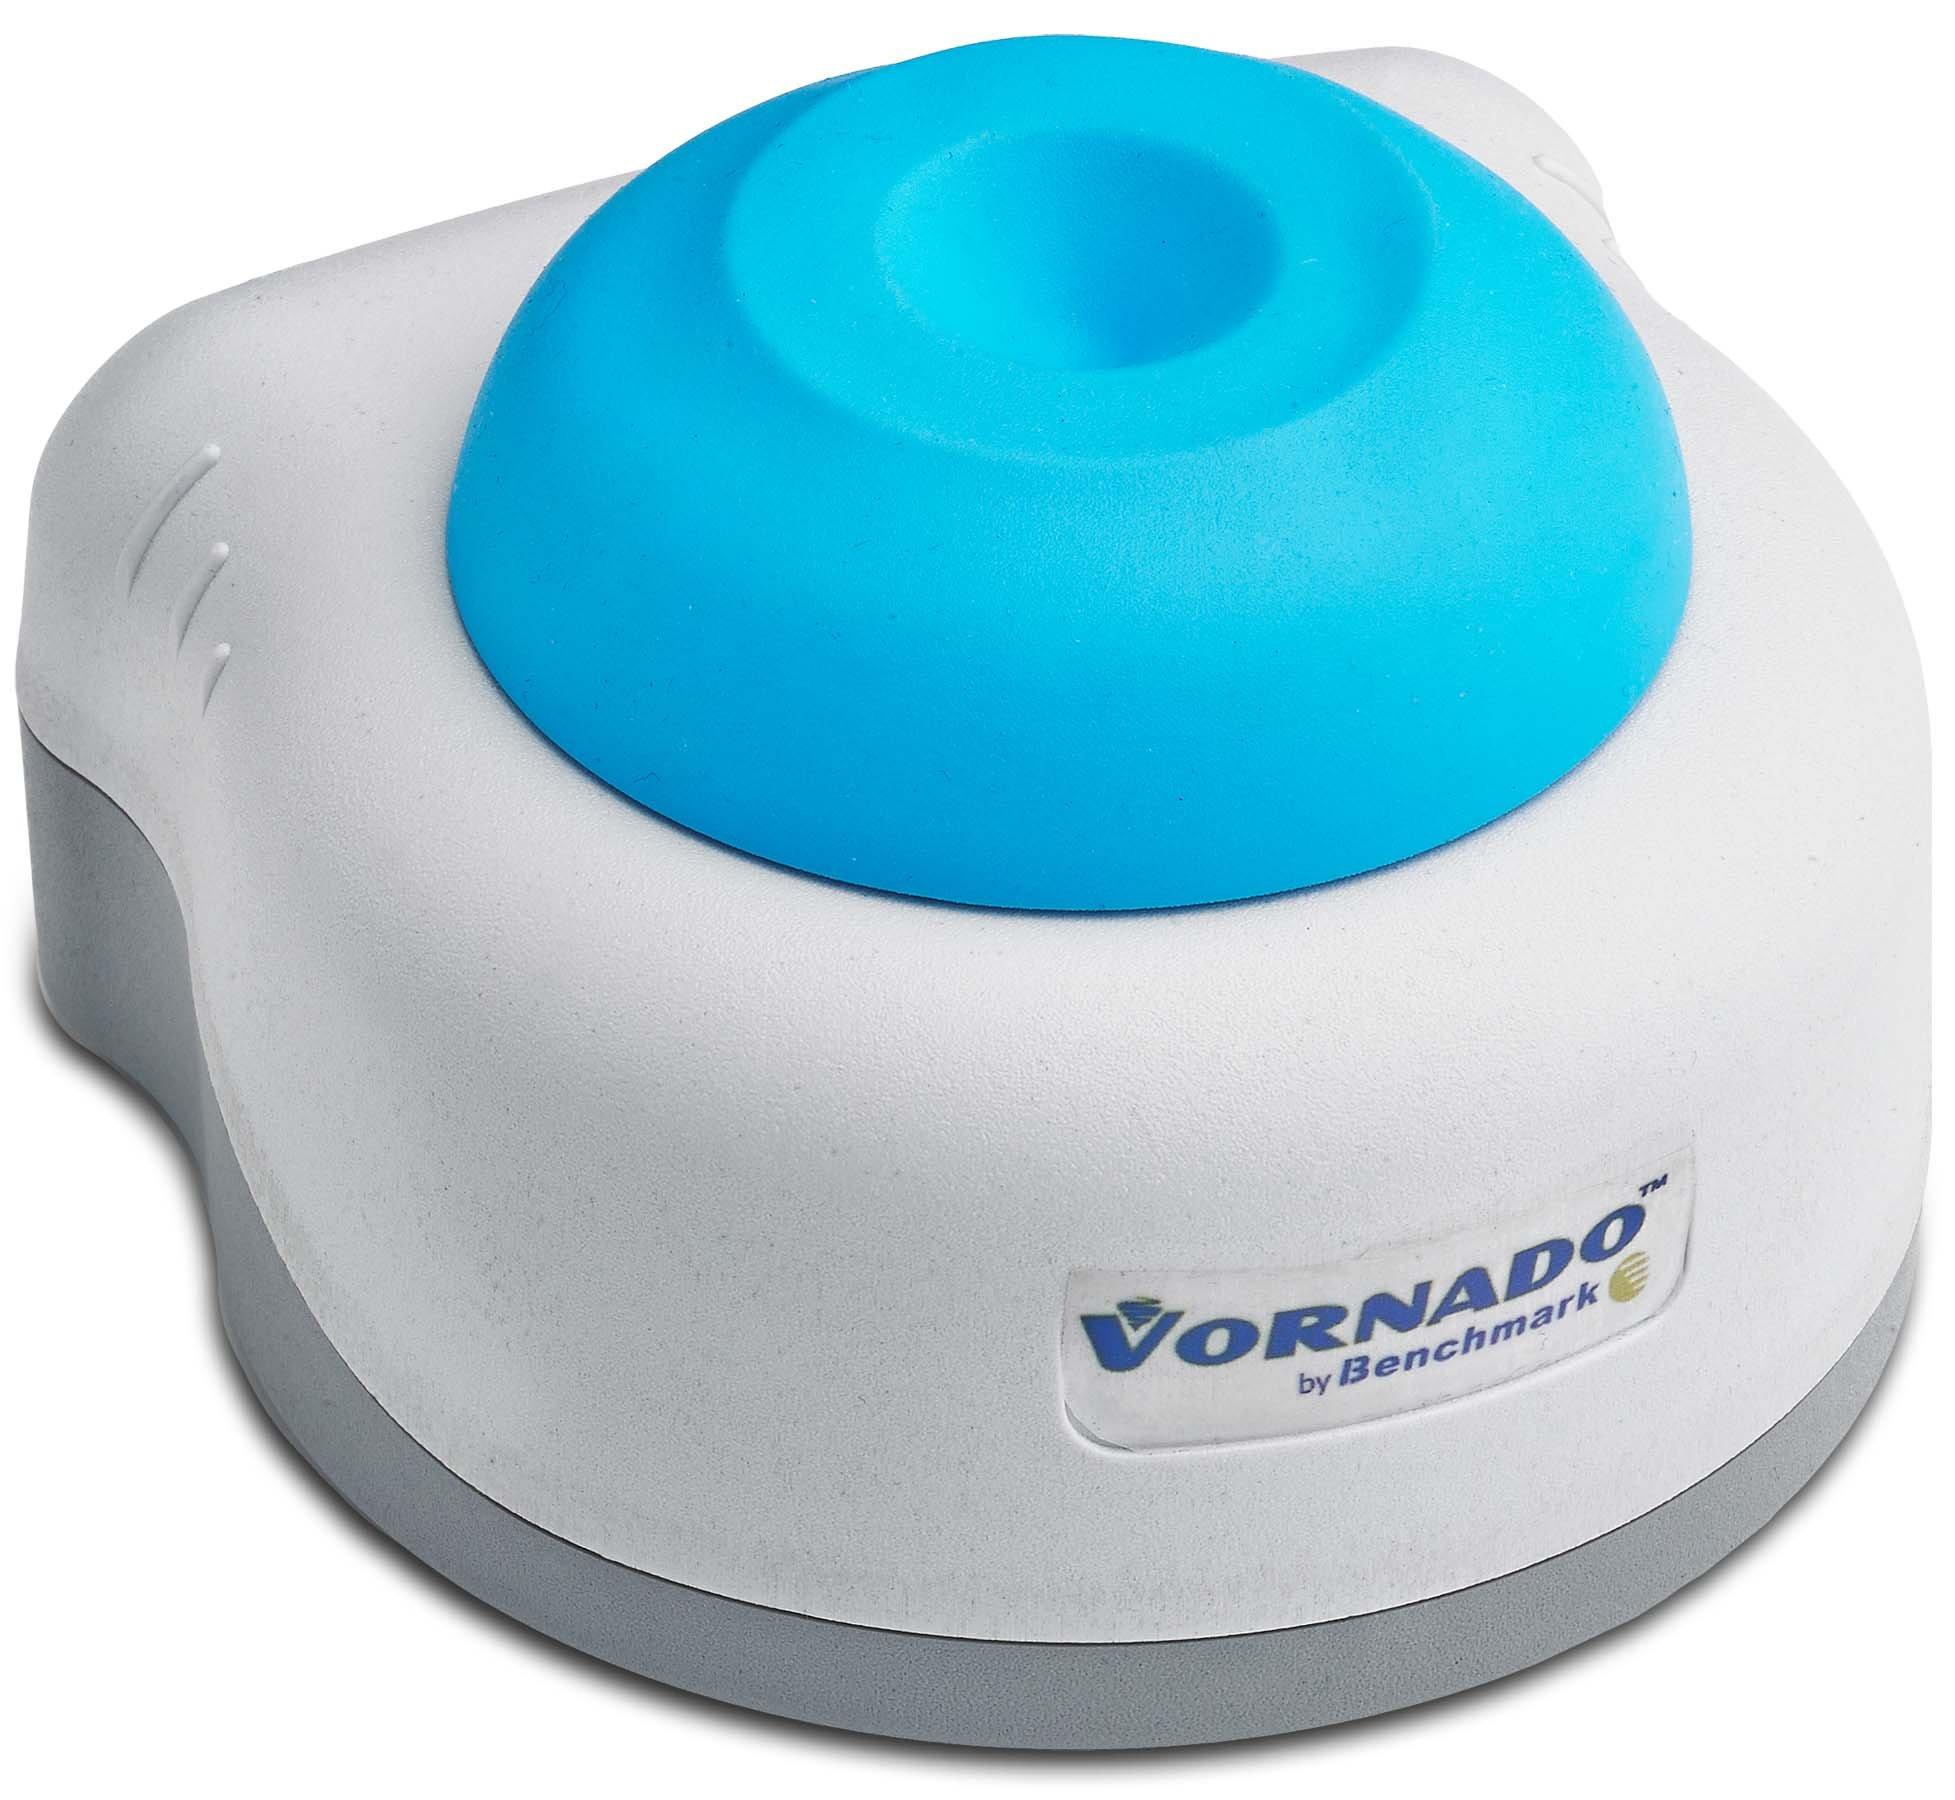 Vornado Miniature Vortexer Mixer - Blue Cup Head